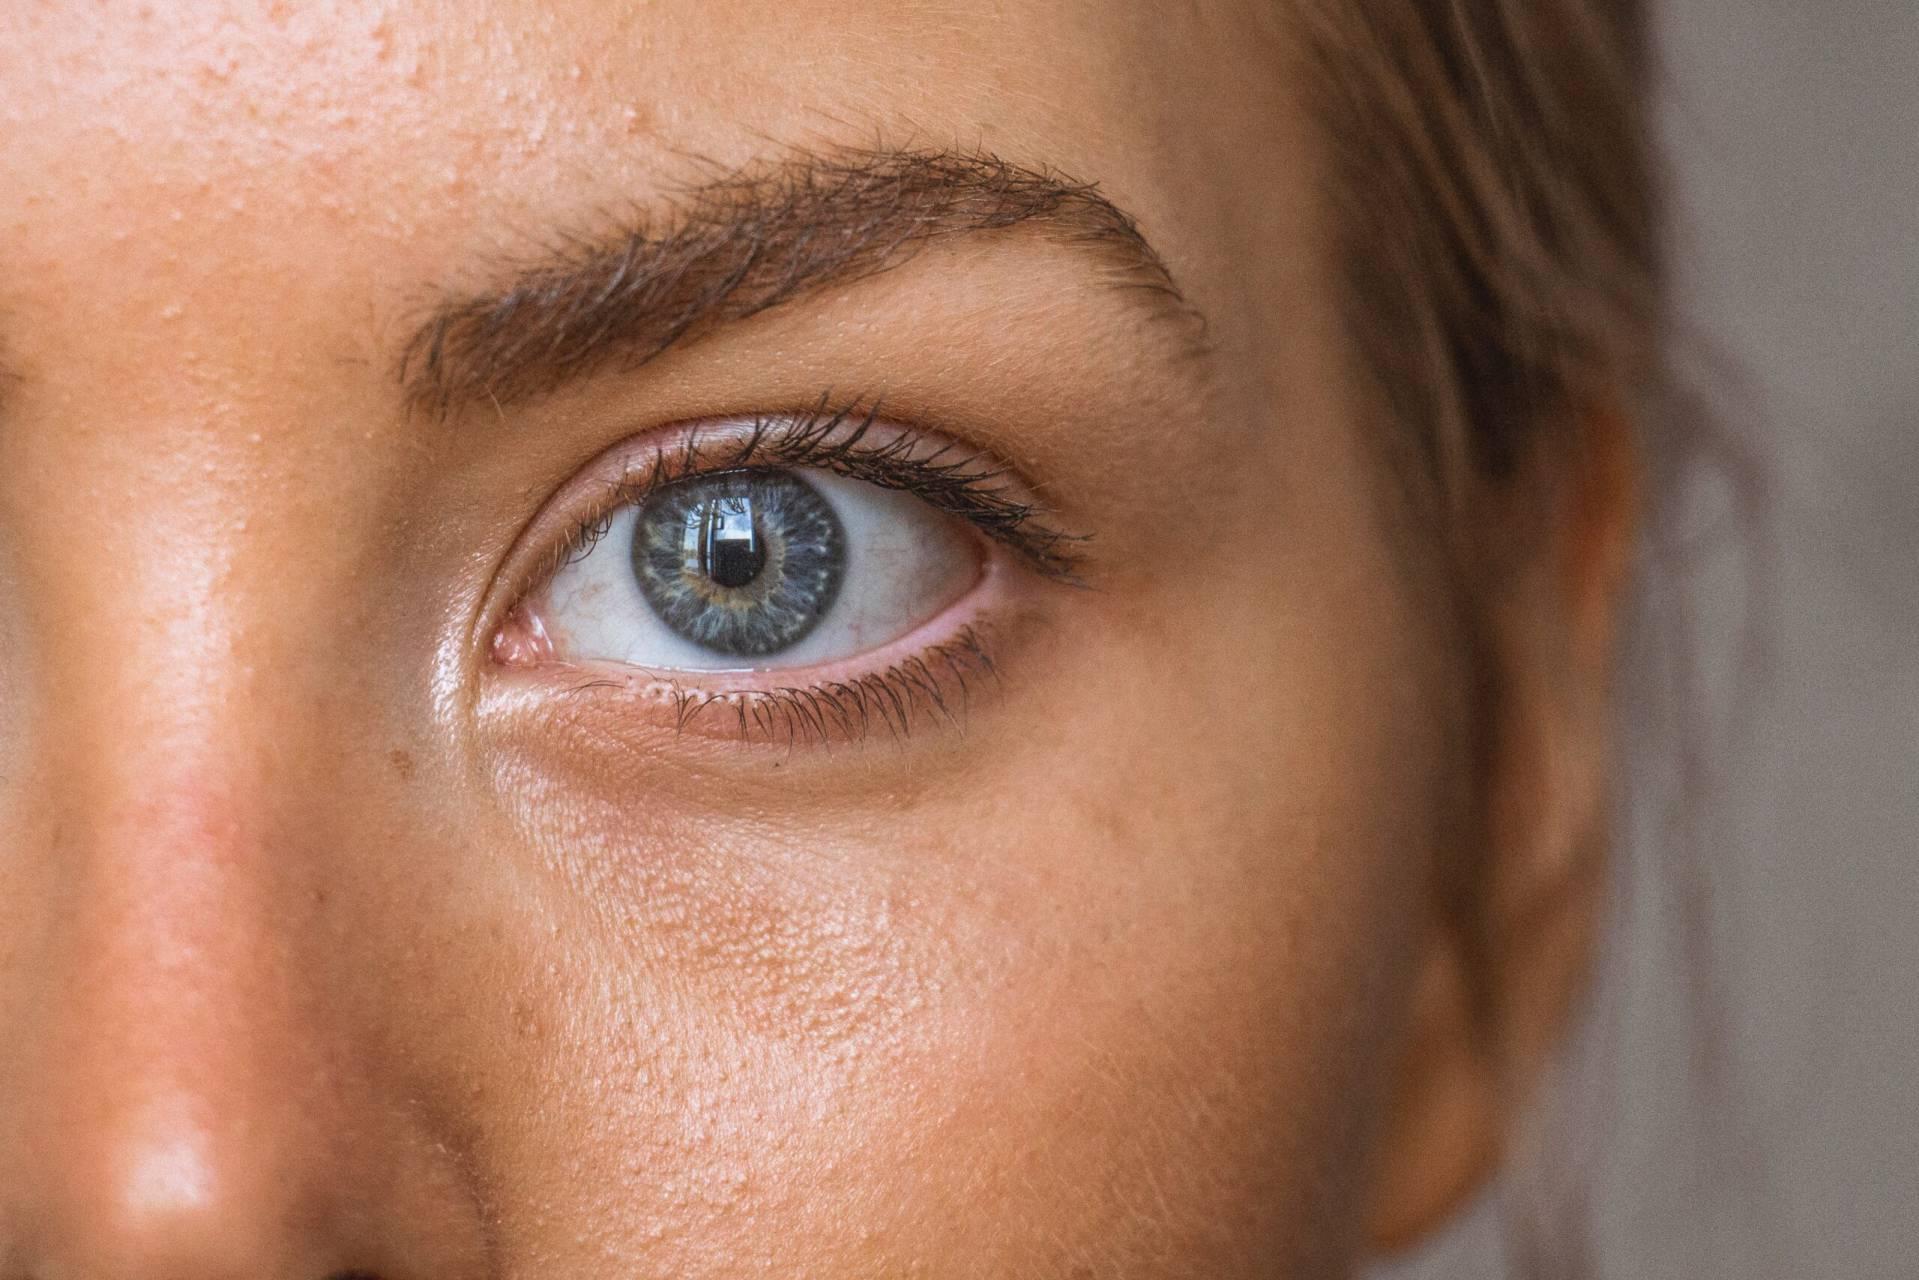 Hypnotiskt öga